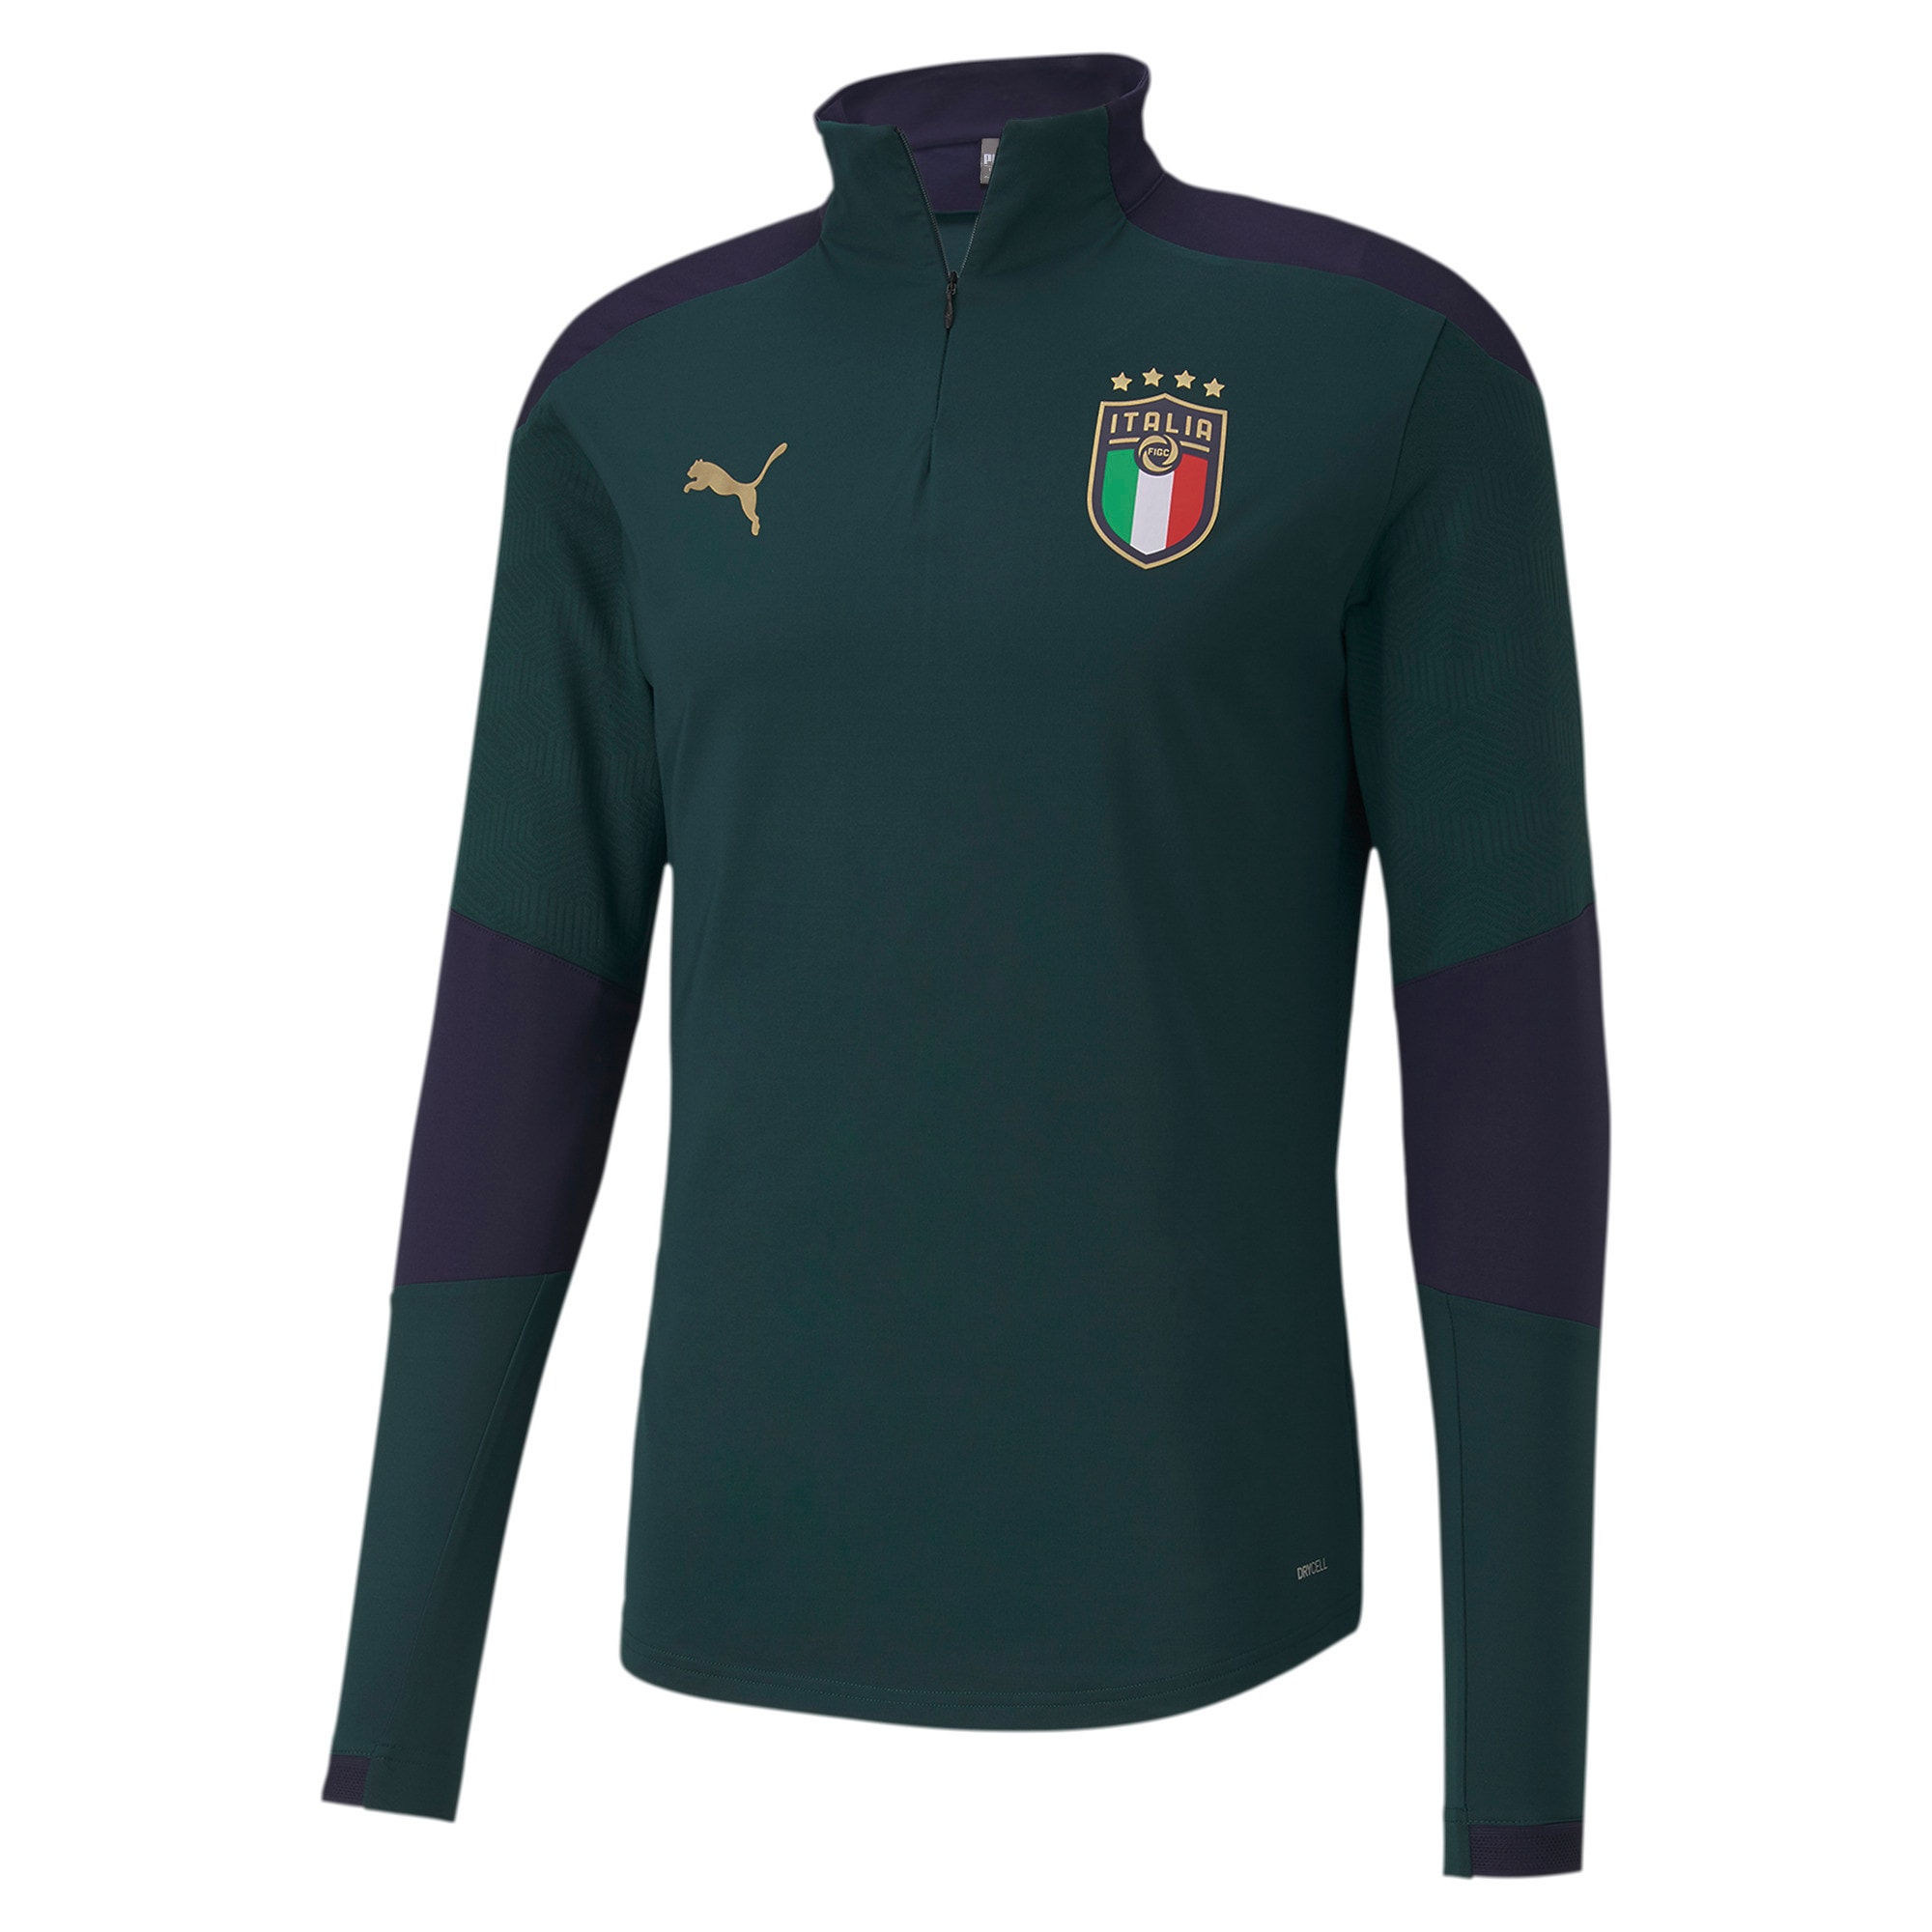 Thumbnail 1 of FIGC イタリア トレーニング 1/4 ジップトップ, Ponderosa Pine-Peacoat, medium-JPN